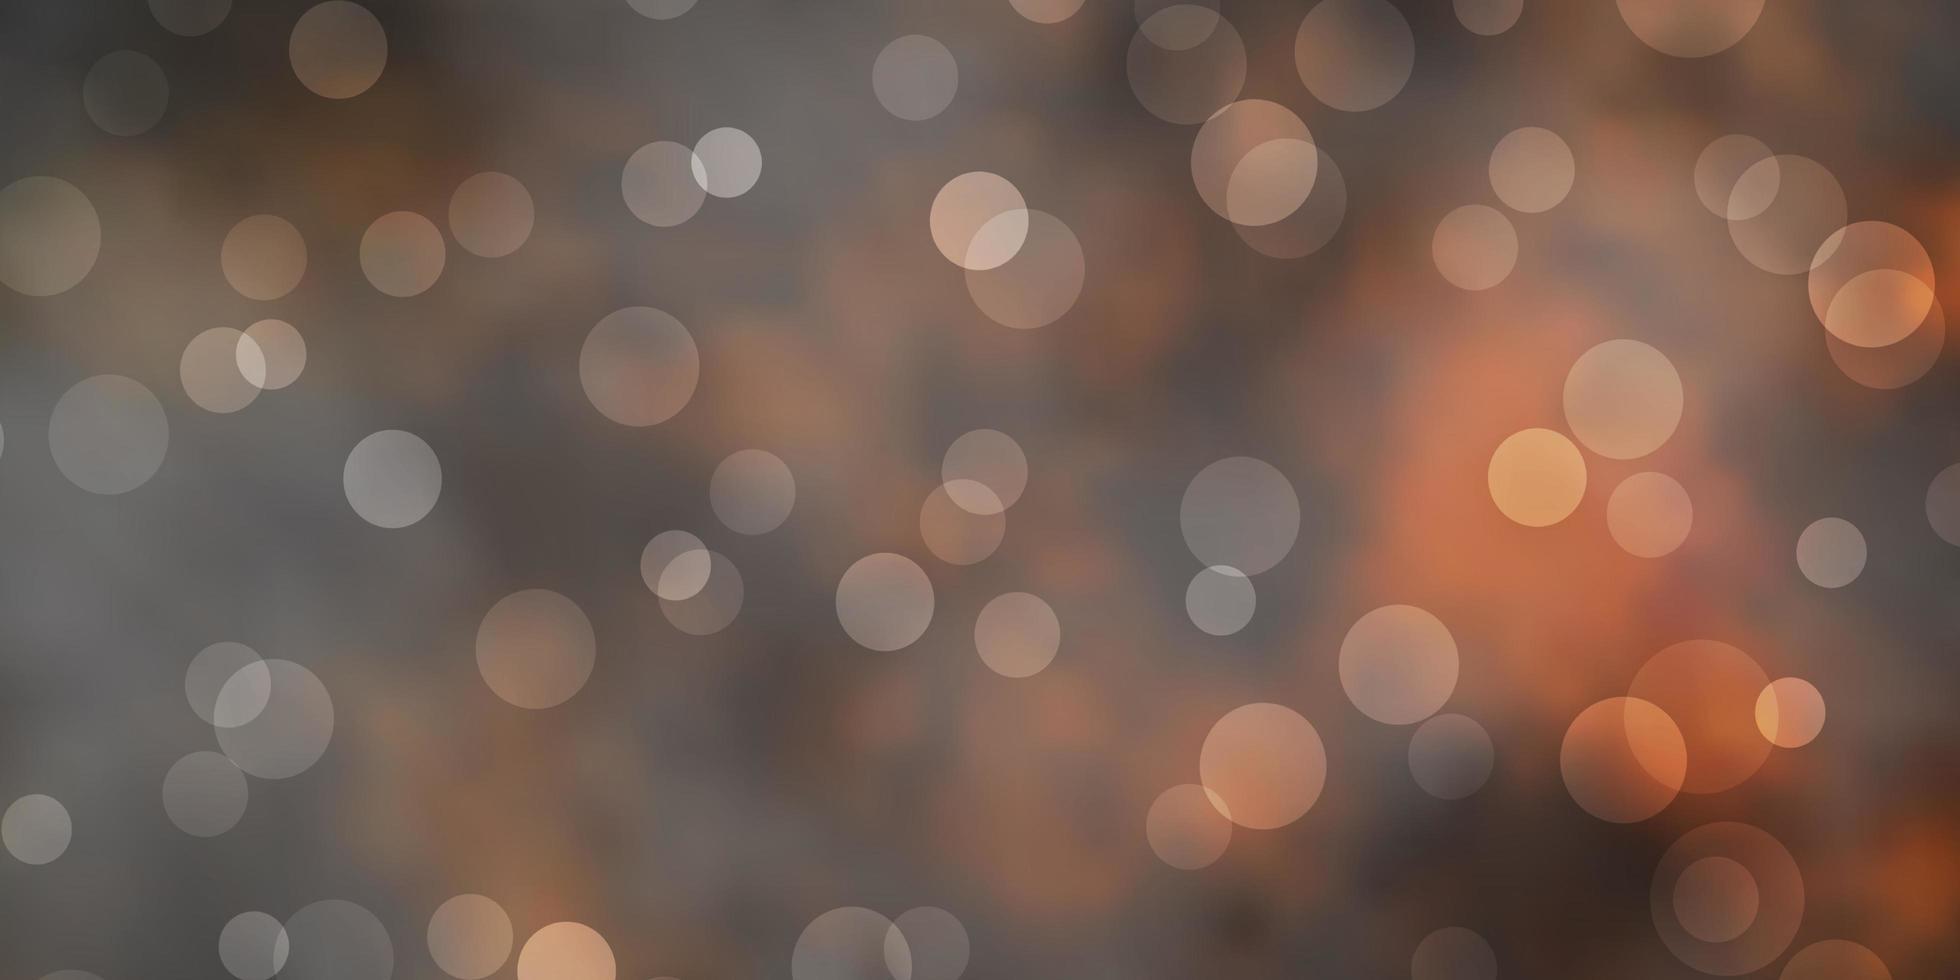 fundo laranja escuro do vetor com manchas.